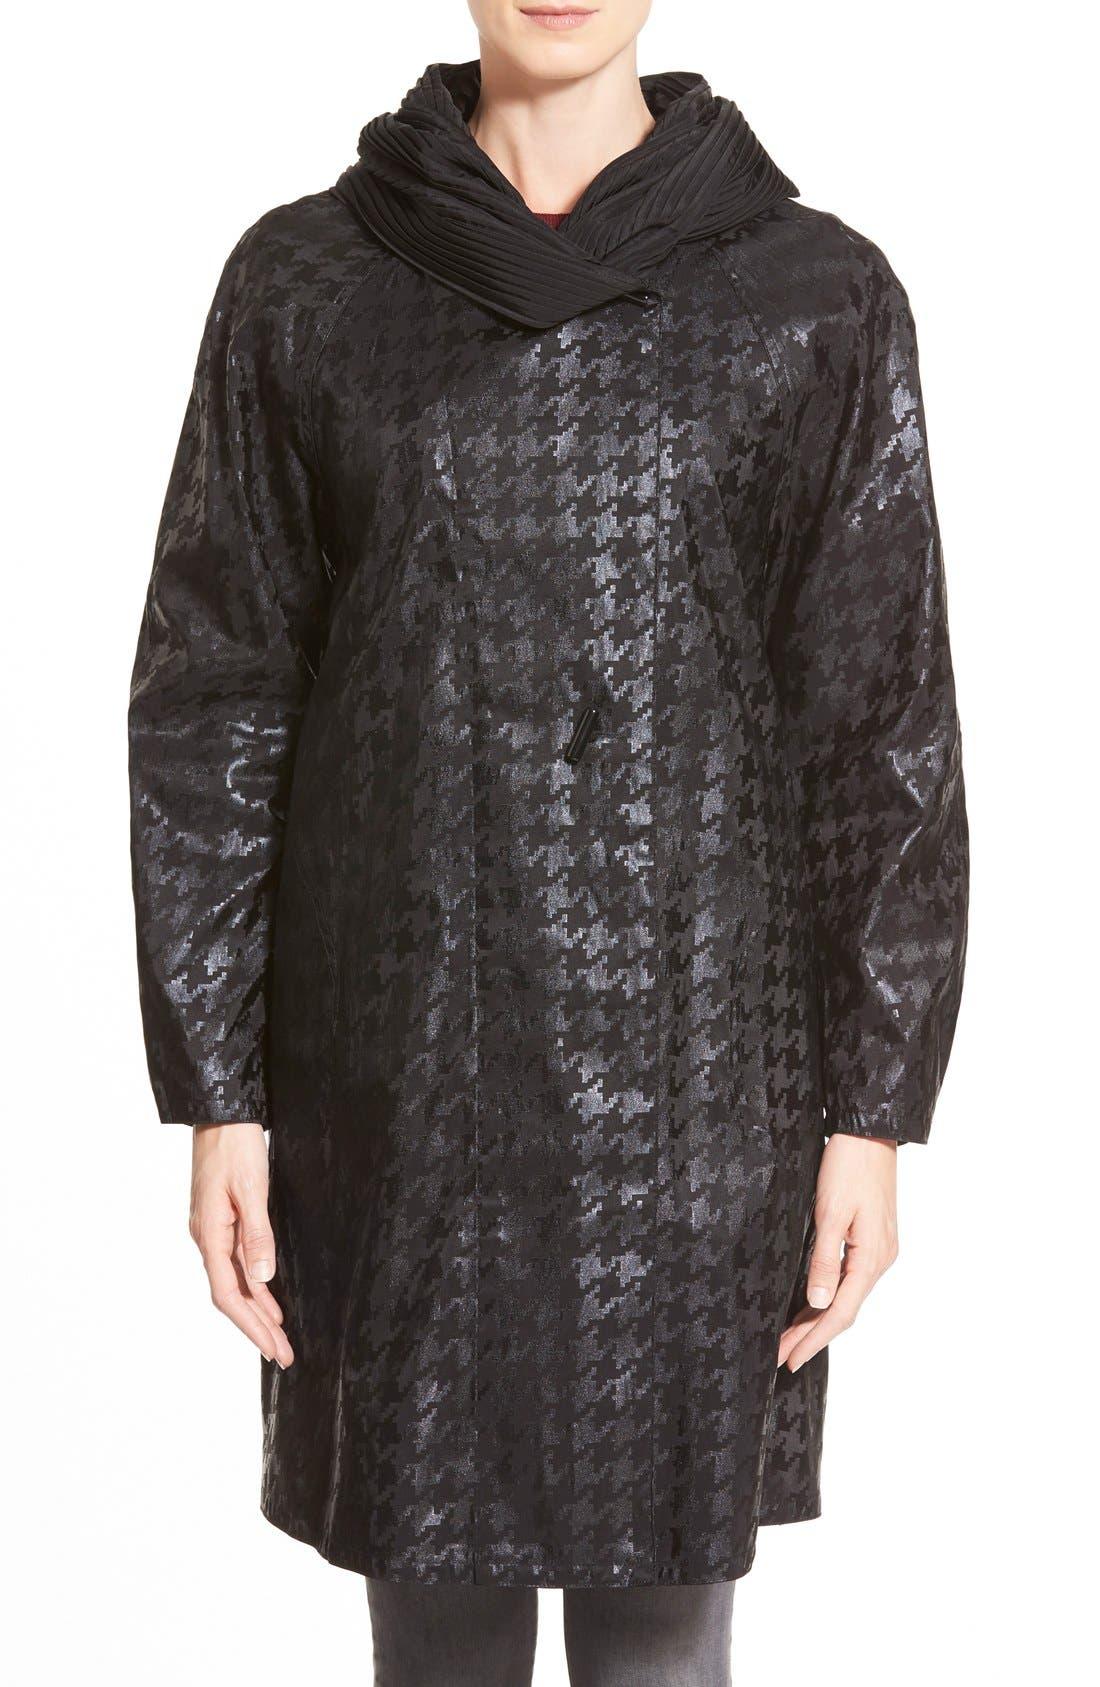 Alternate Image 1 Selected - MycraPac DesignerWear 'ShortDonatella' Reversible Pleat Hood PackableTravel Coat